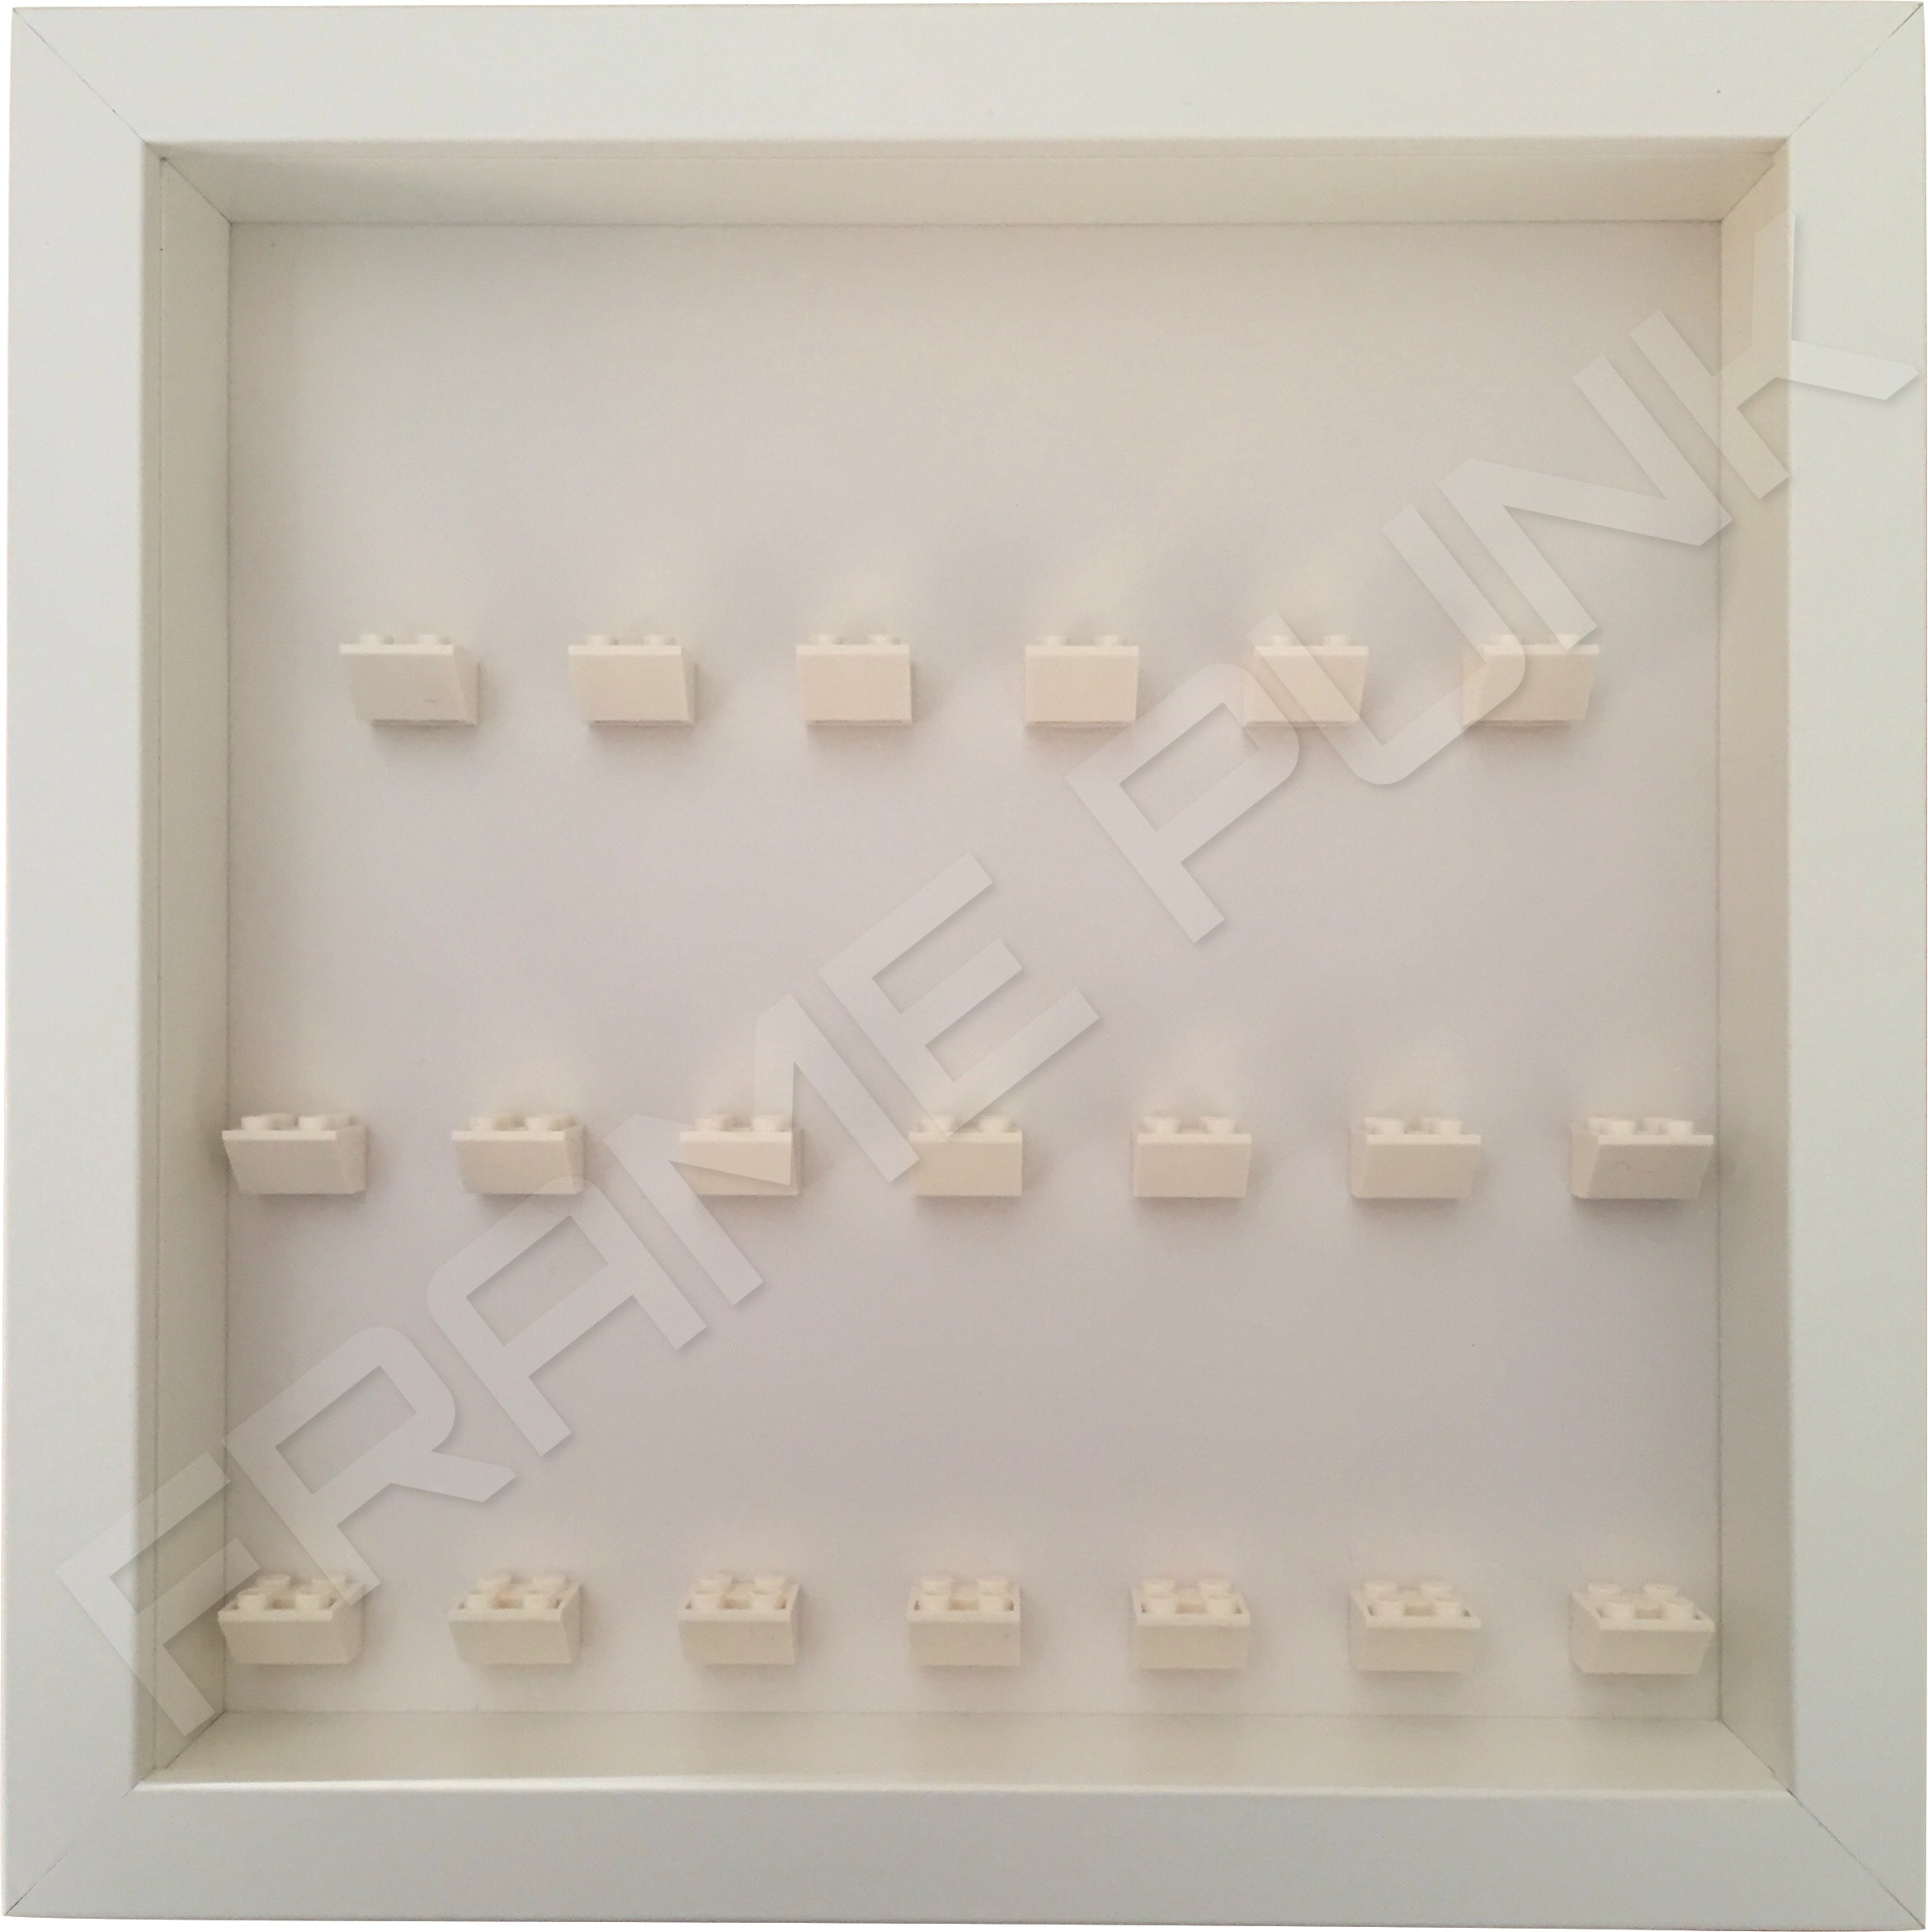 Lego Minifigure Display Frame White Background Frame Punk